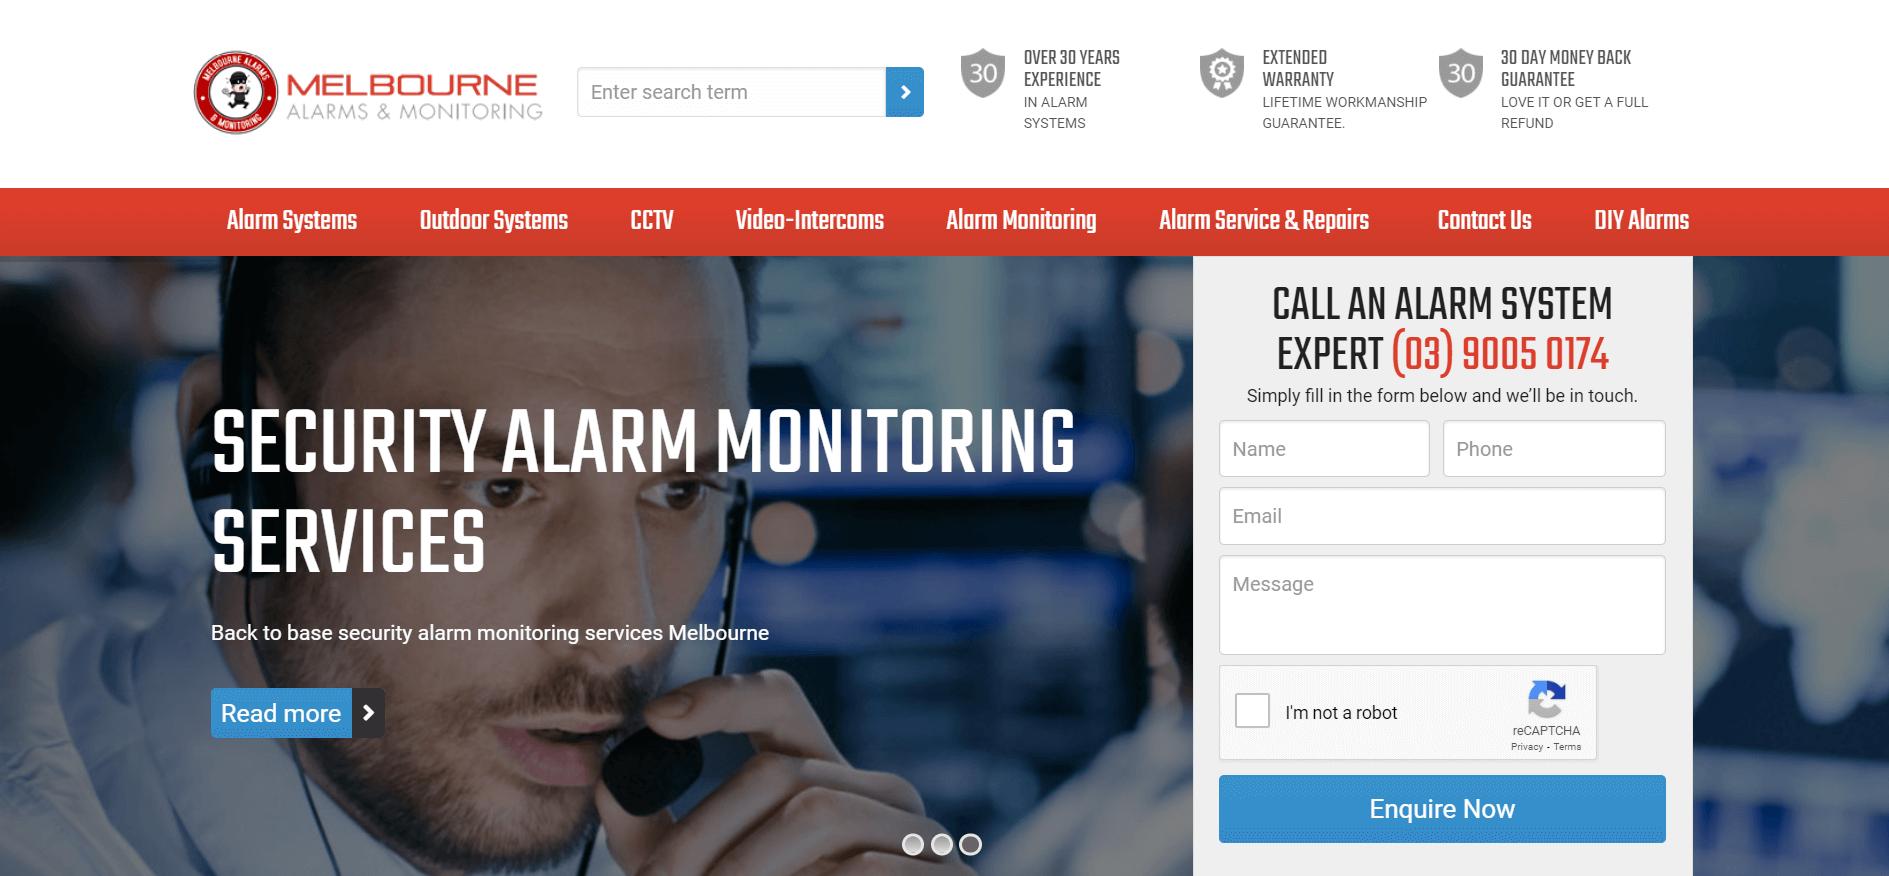 melbourne alarms